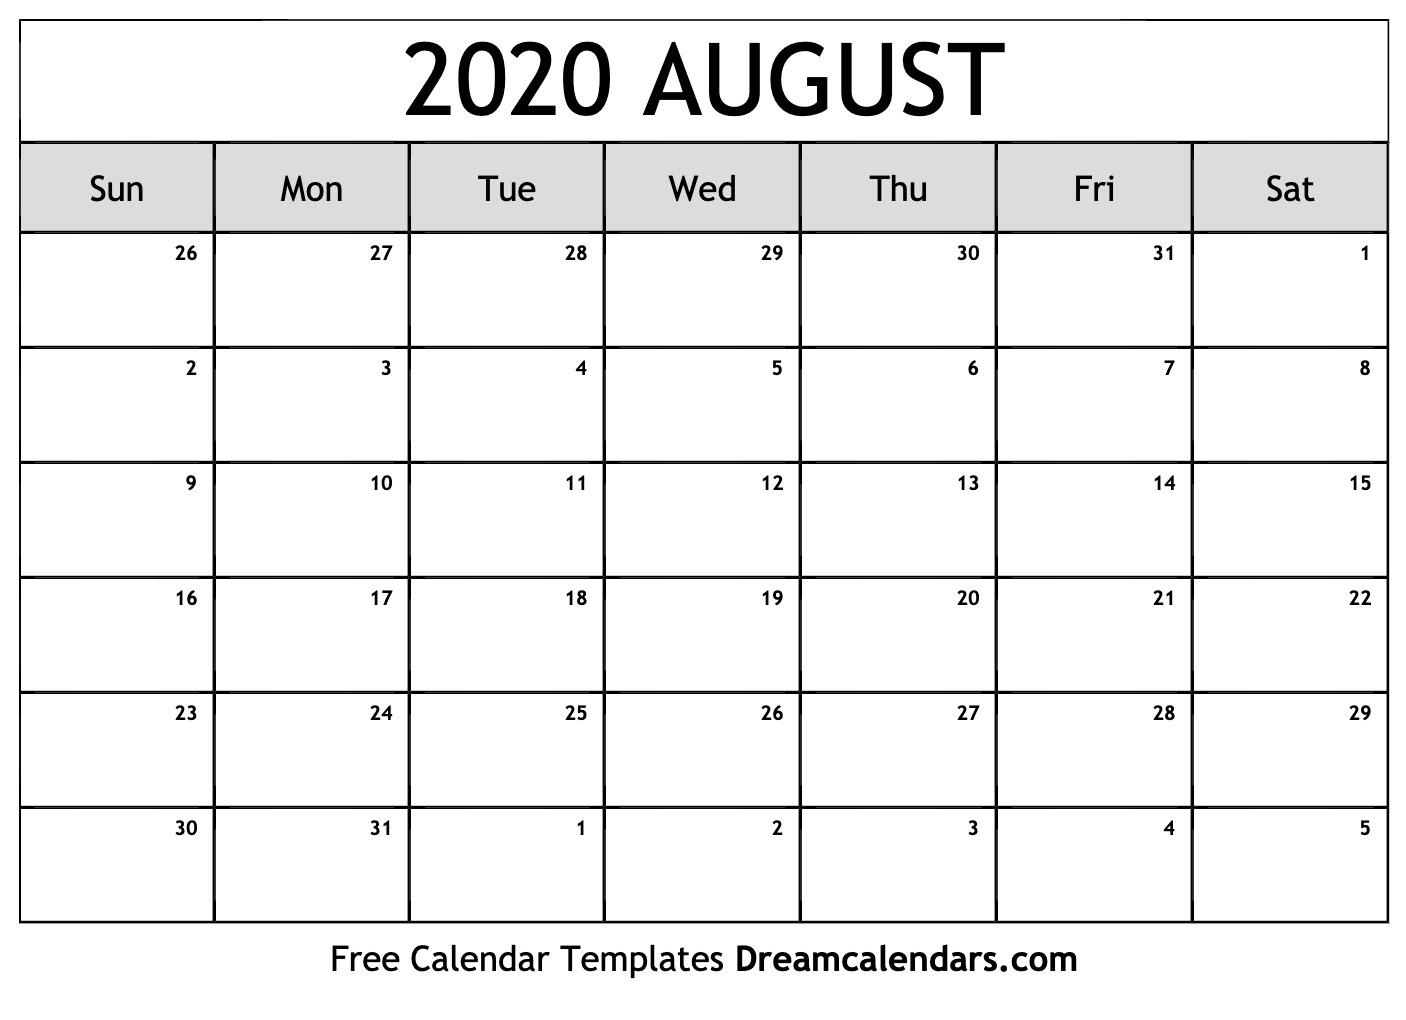 August 2020 Calendars - Wpa.wpart.co